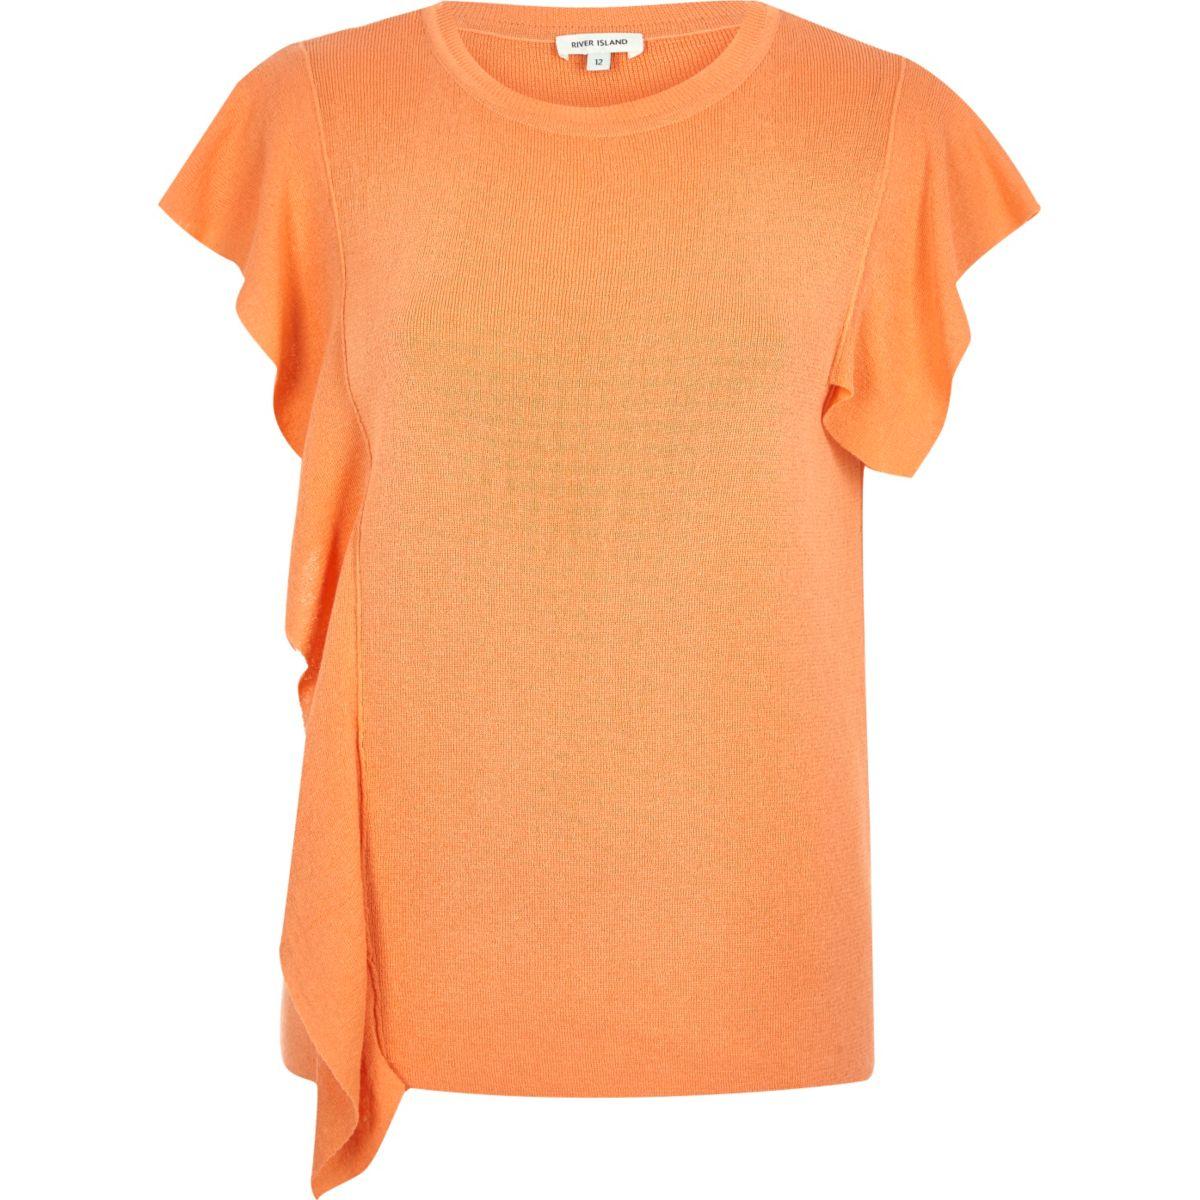 Orange frill front top